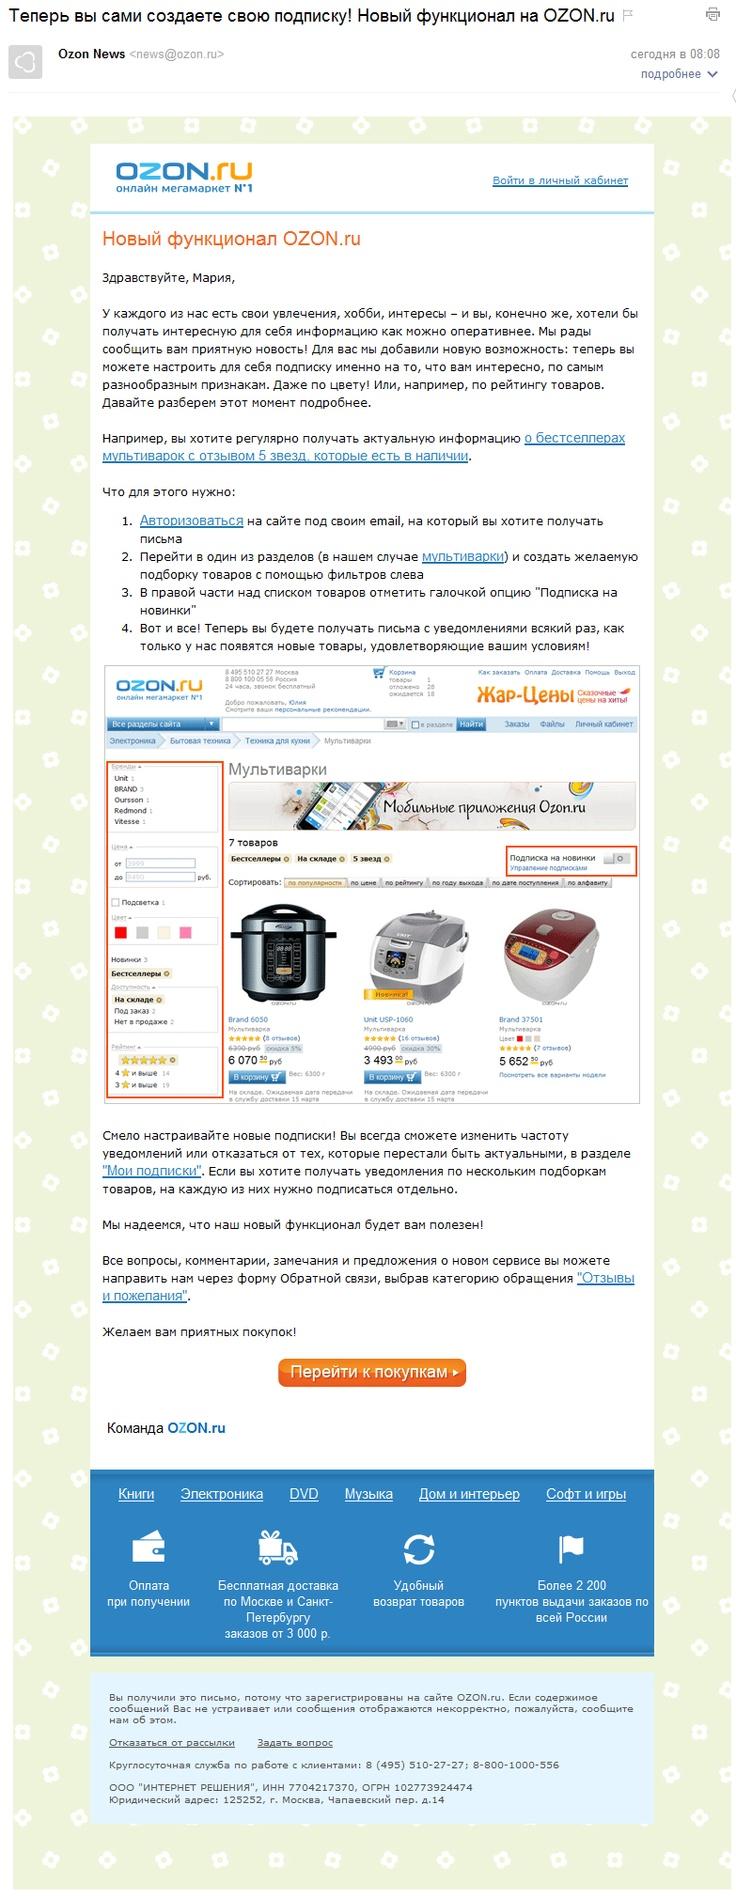 Ozon.ru: анонс нового функционала подписки (21/03/2013). Процесс настройки показан на примере - хорошо.